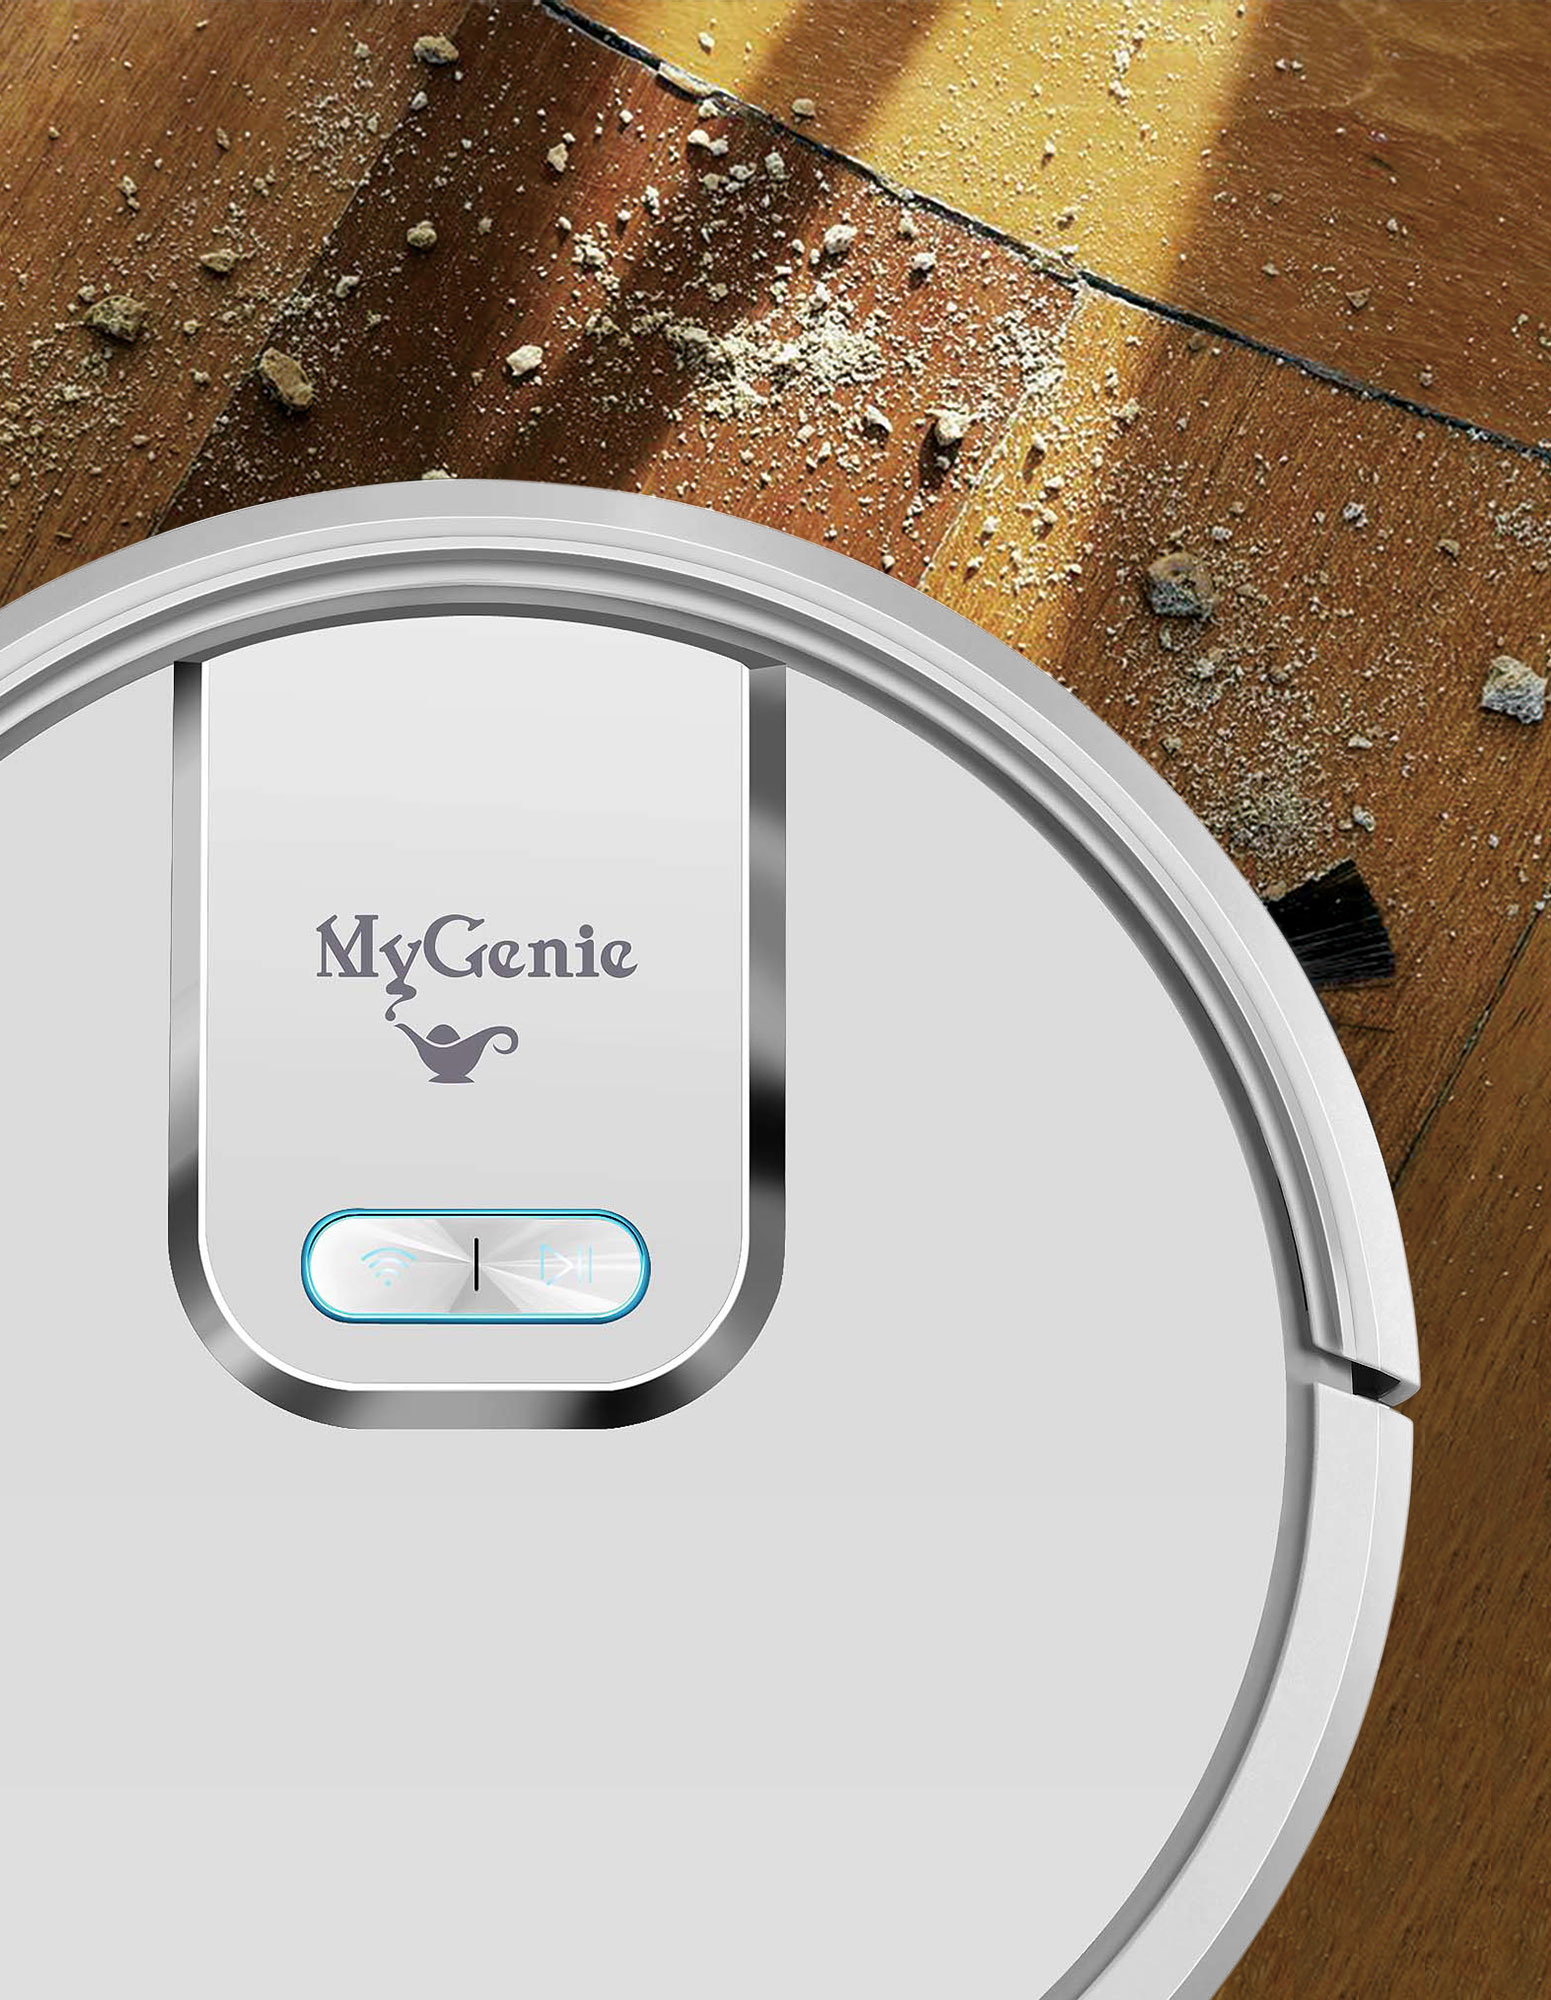 thumbnail 18 - MyGenie WI-FI GMAX Robotic Vacuum Cleaner Mop App Control Dry & Wet Auto Robot